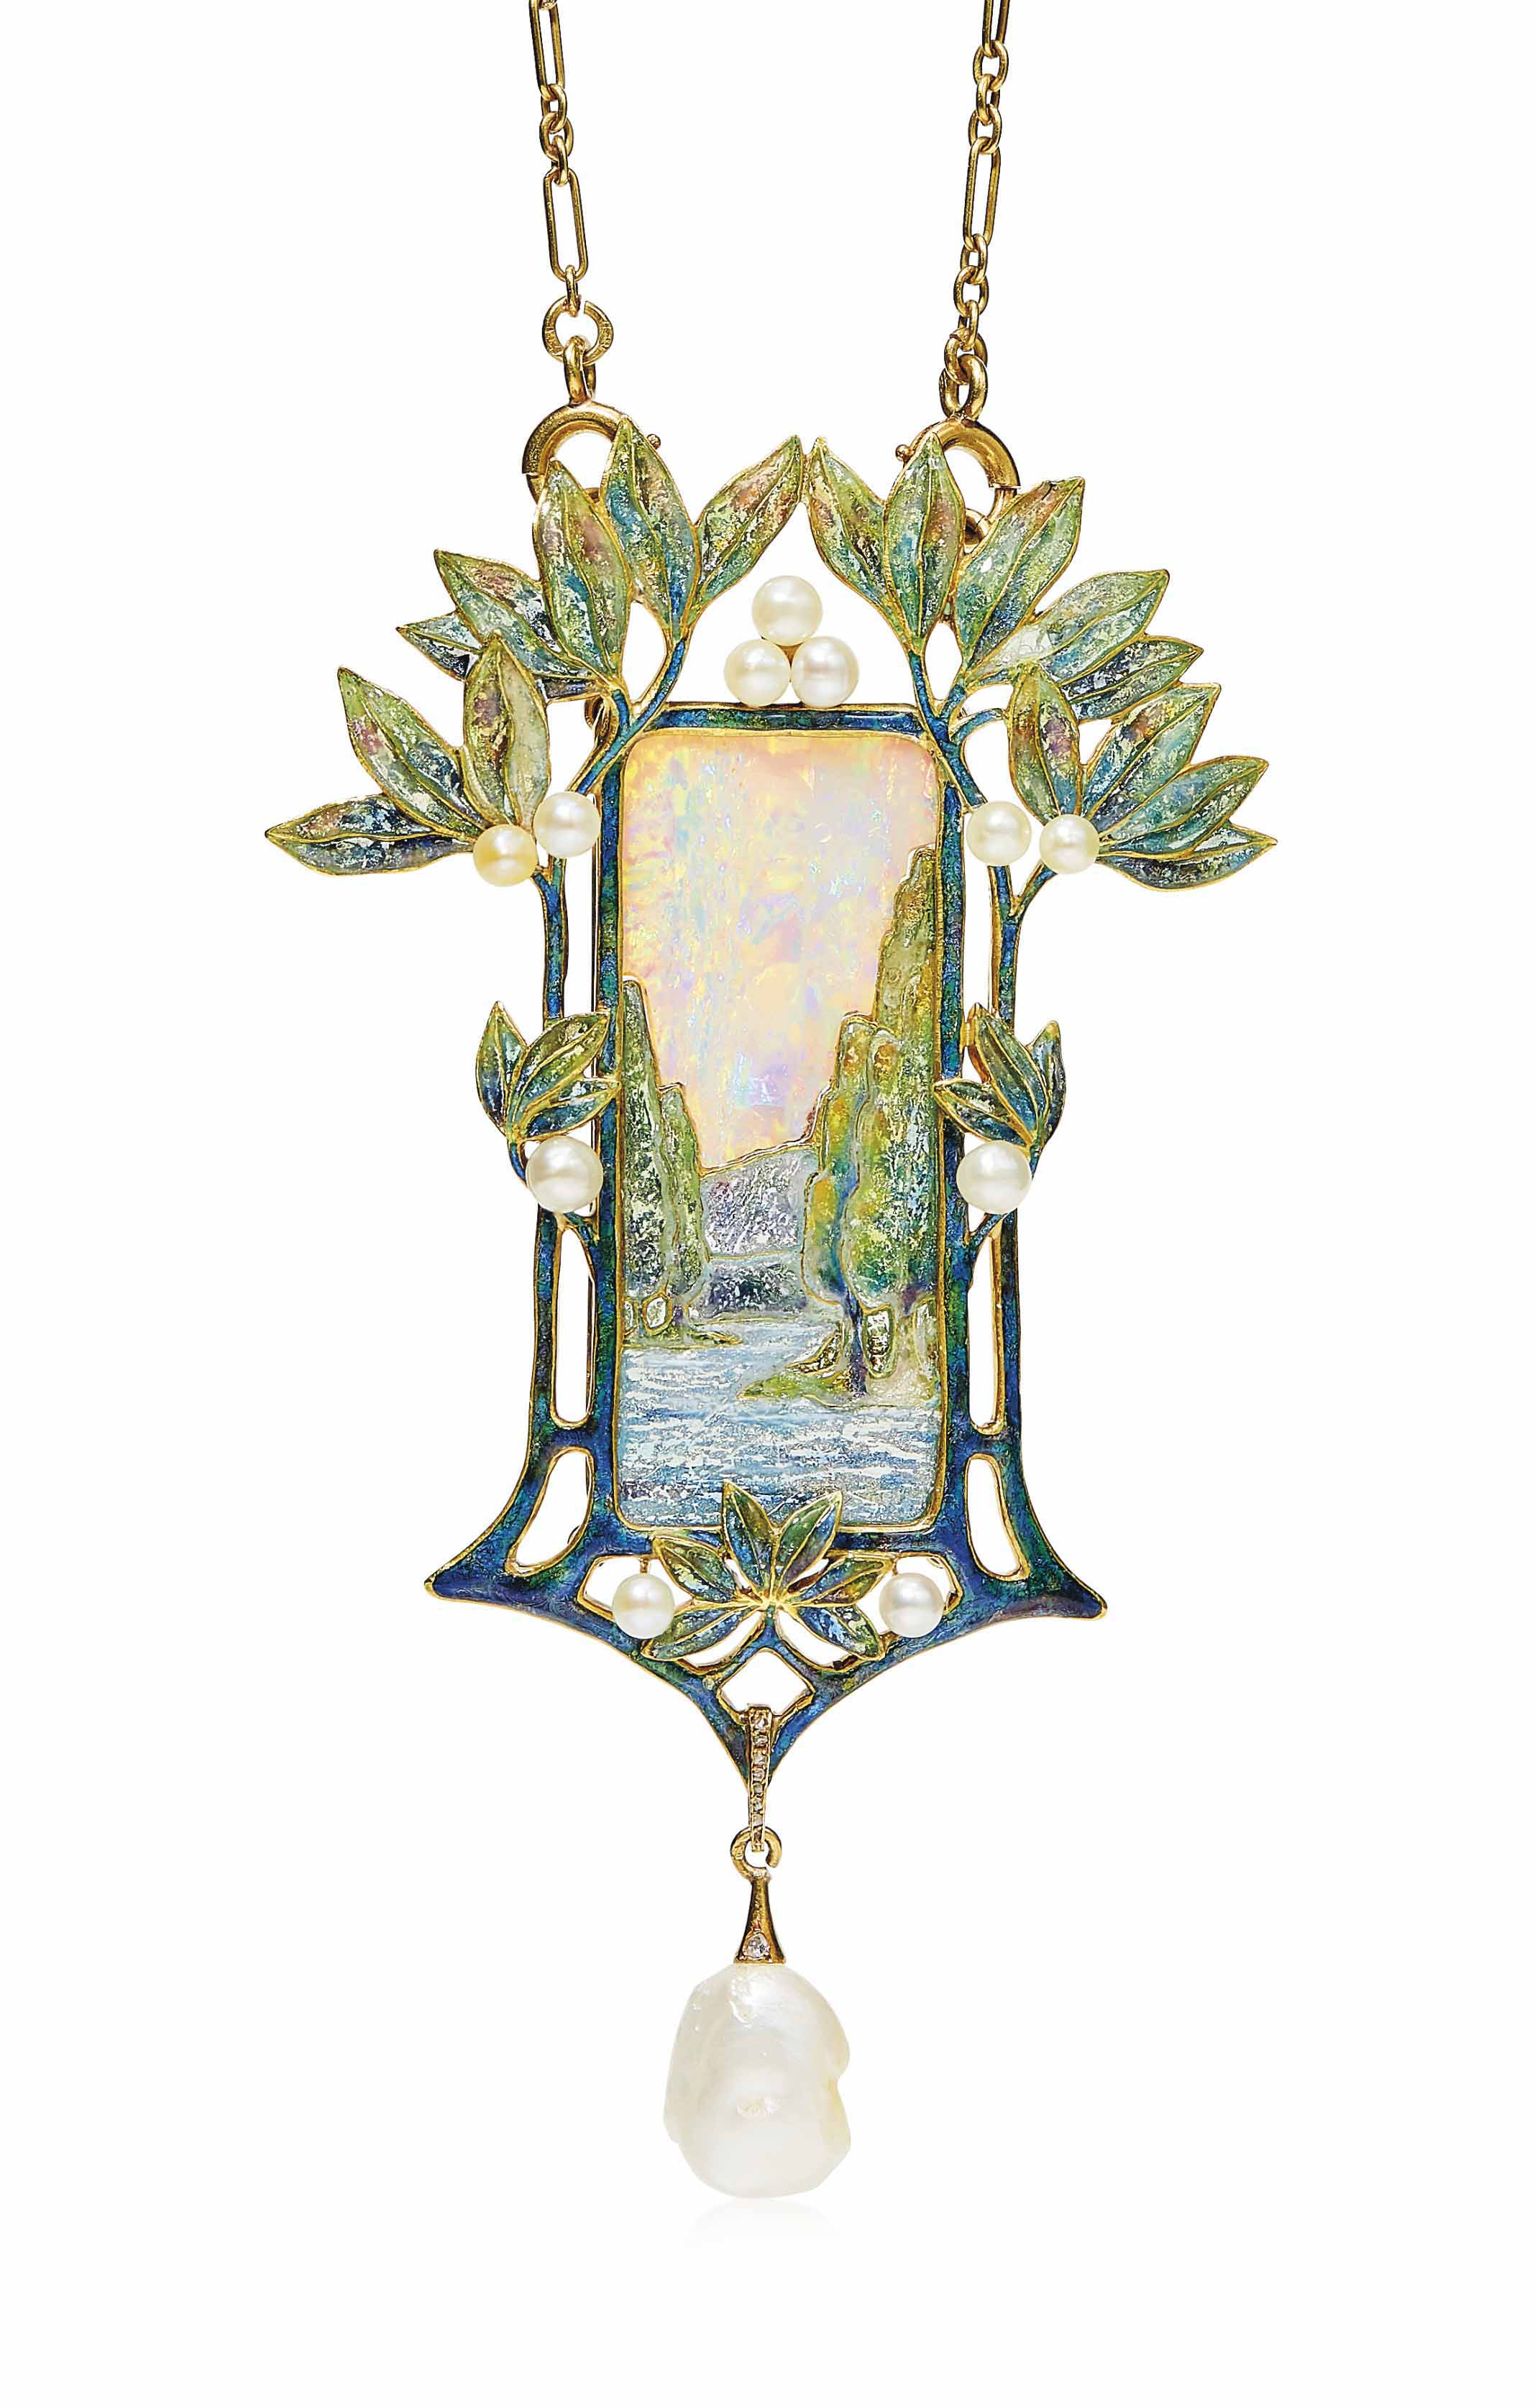 AN ART NOUVEAU OPAL, ENAMEL AND PEARL PENDENT NECKLACE, BY GEORGES FOUQUET